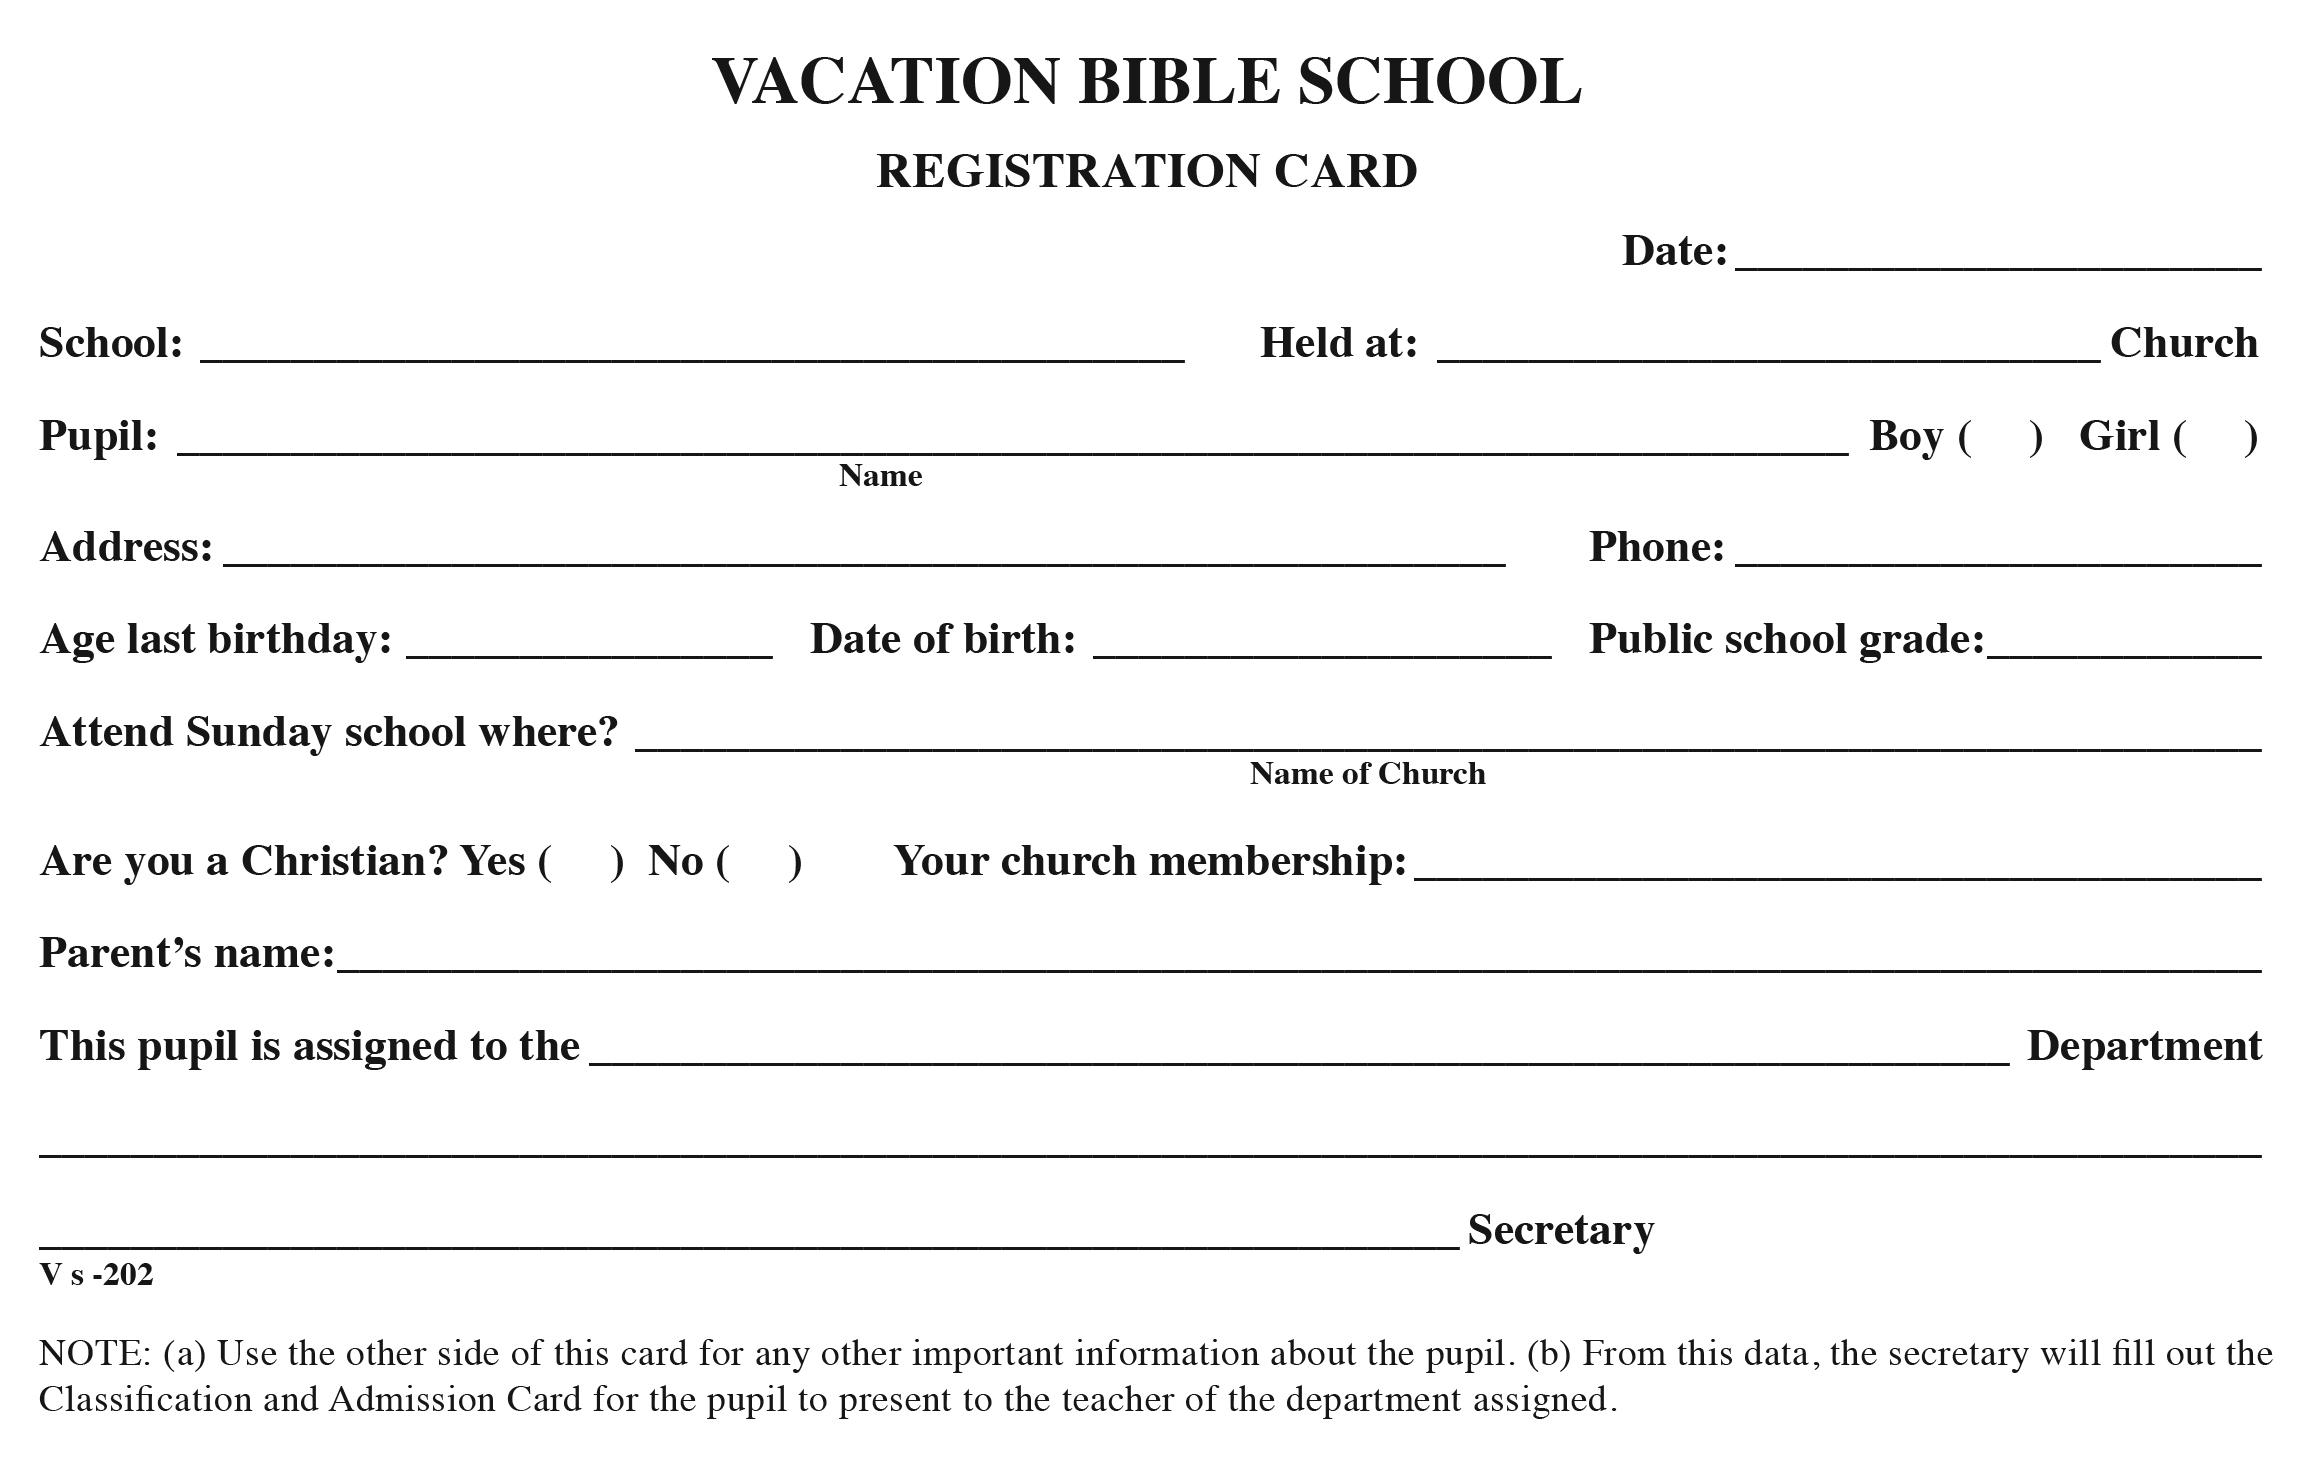 vbs registration cards sunday school publishing board